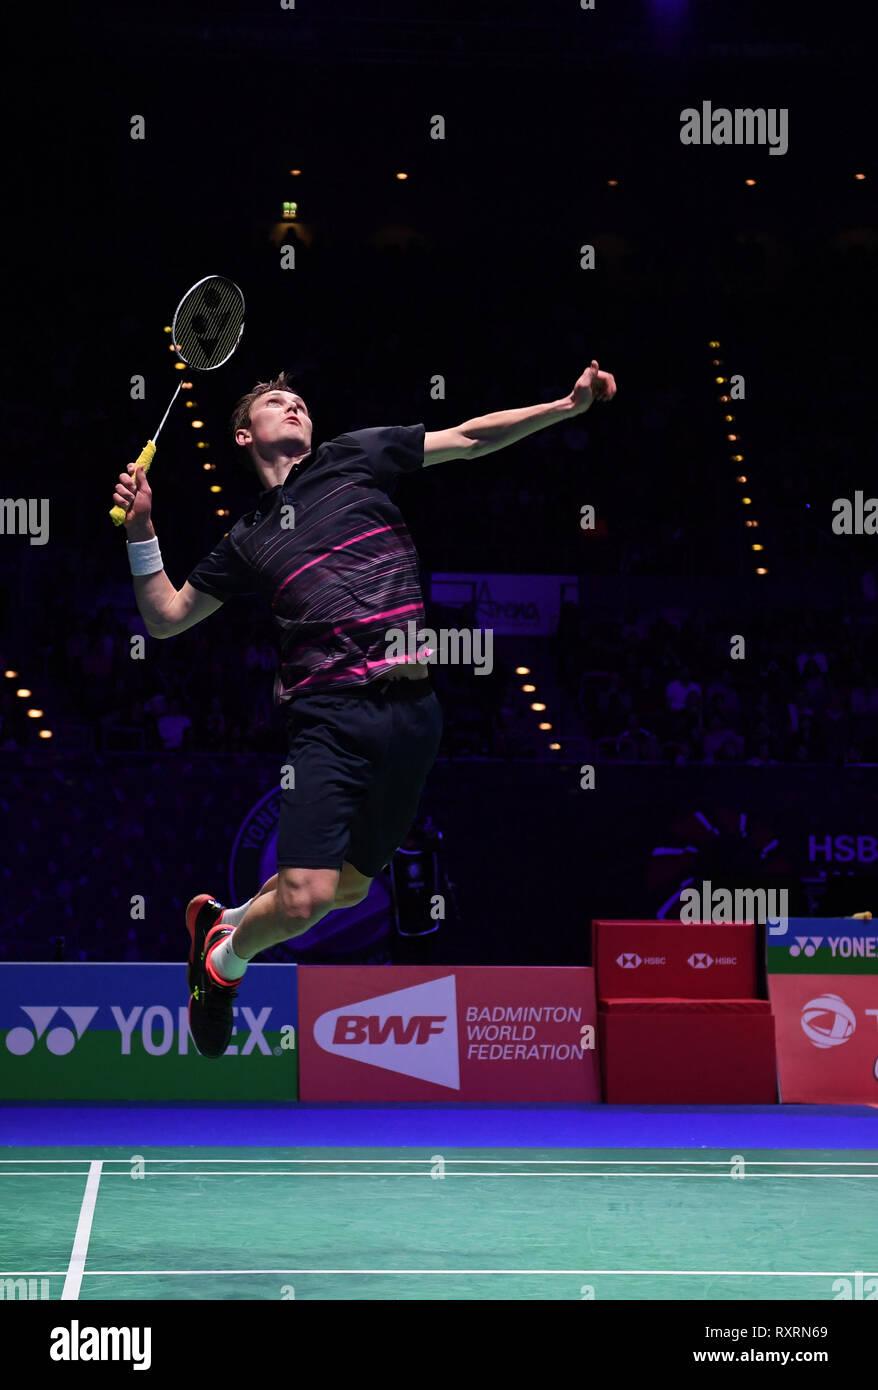 Arena Birmingham Birmingham Uk 10th Mar 2019 Yonex All England Open Badminton Championships Day 5 Mens